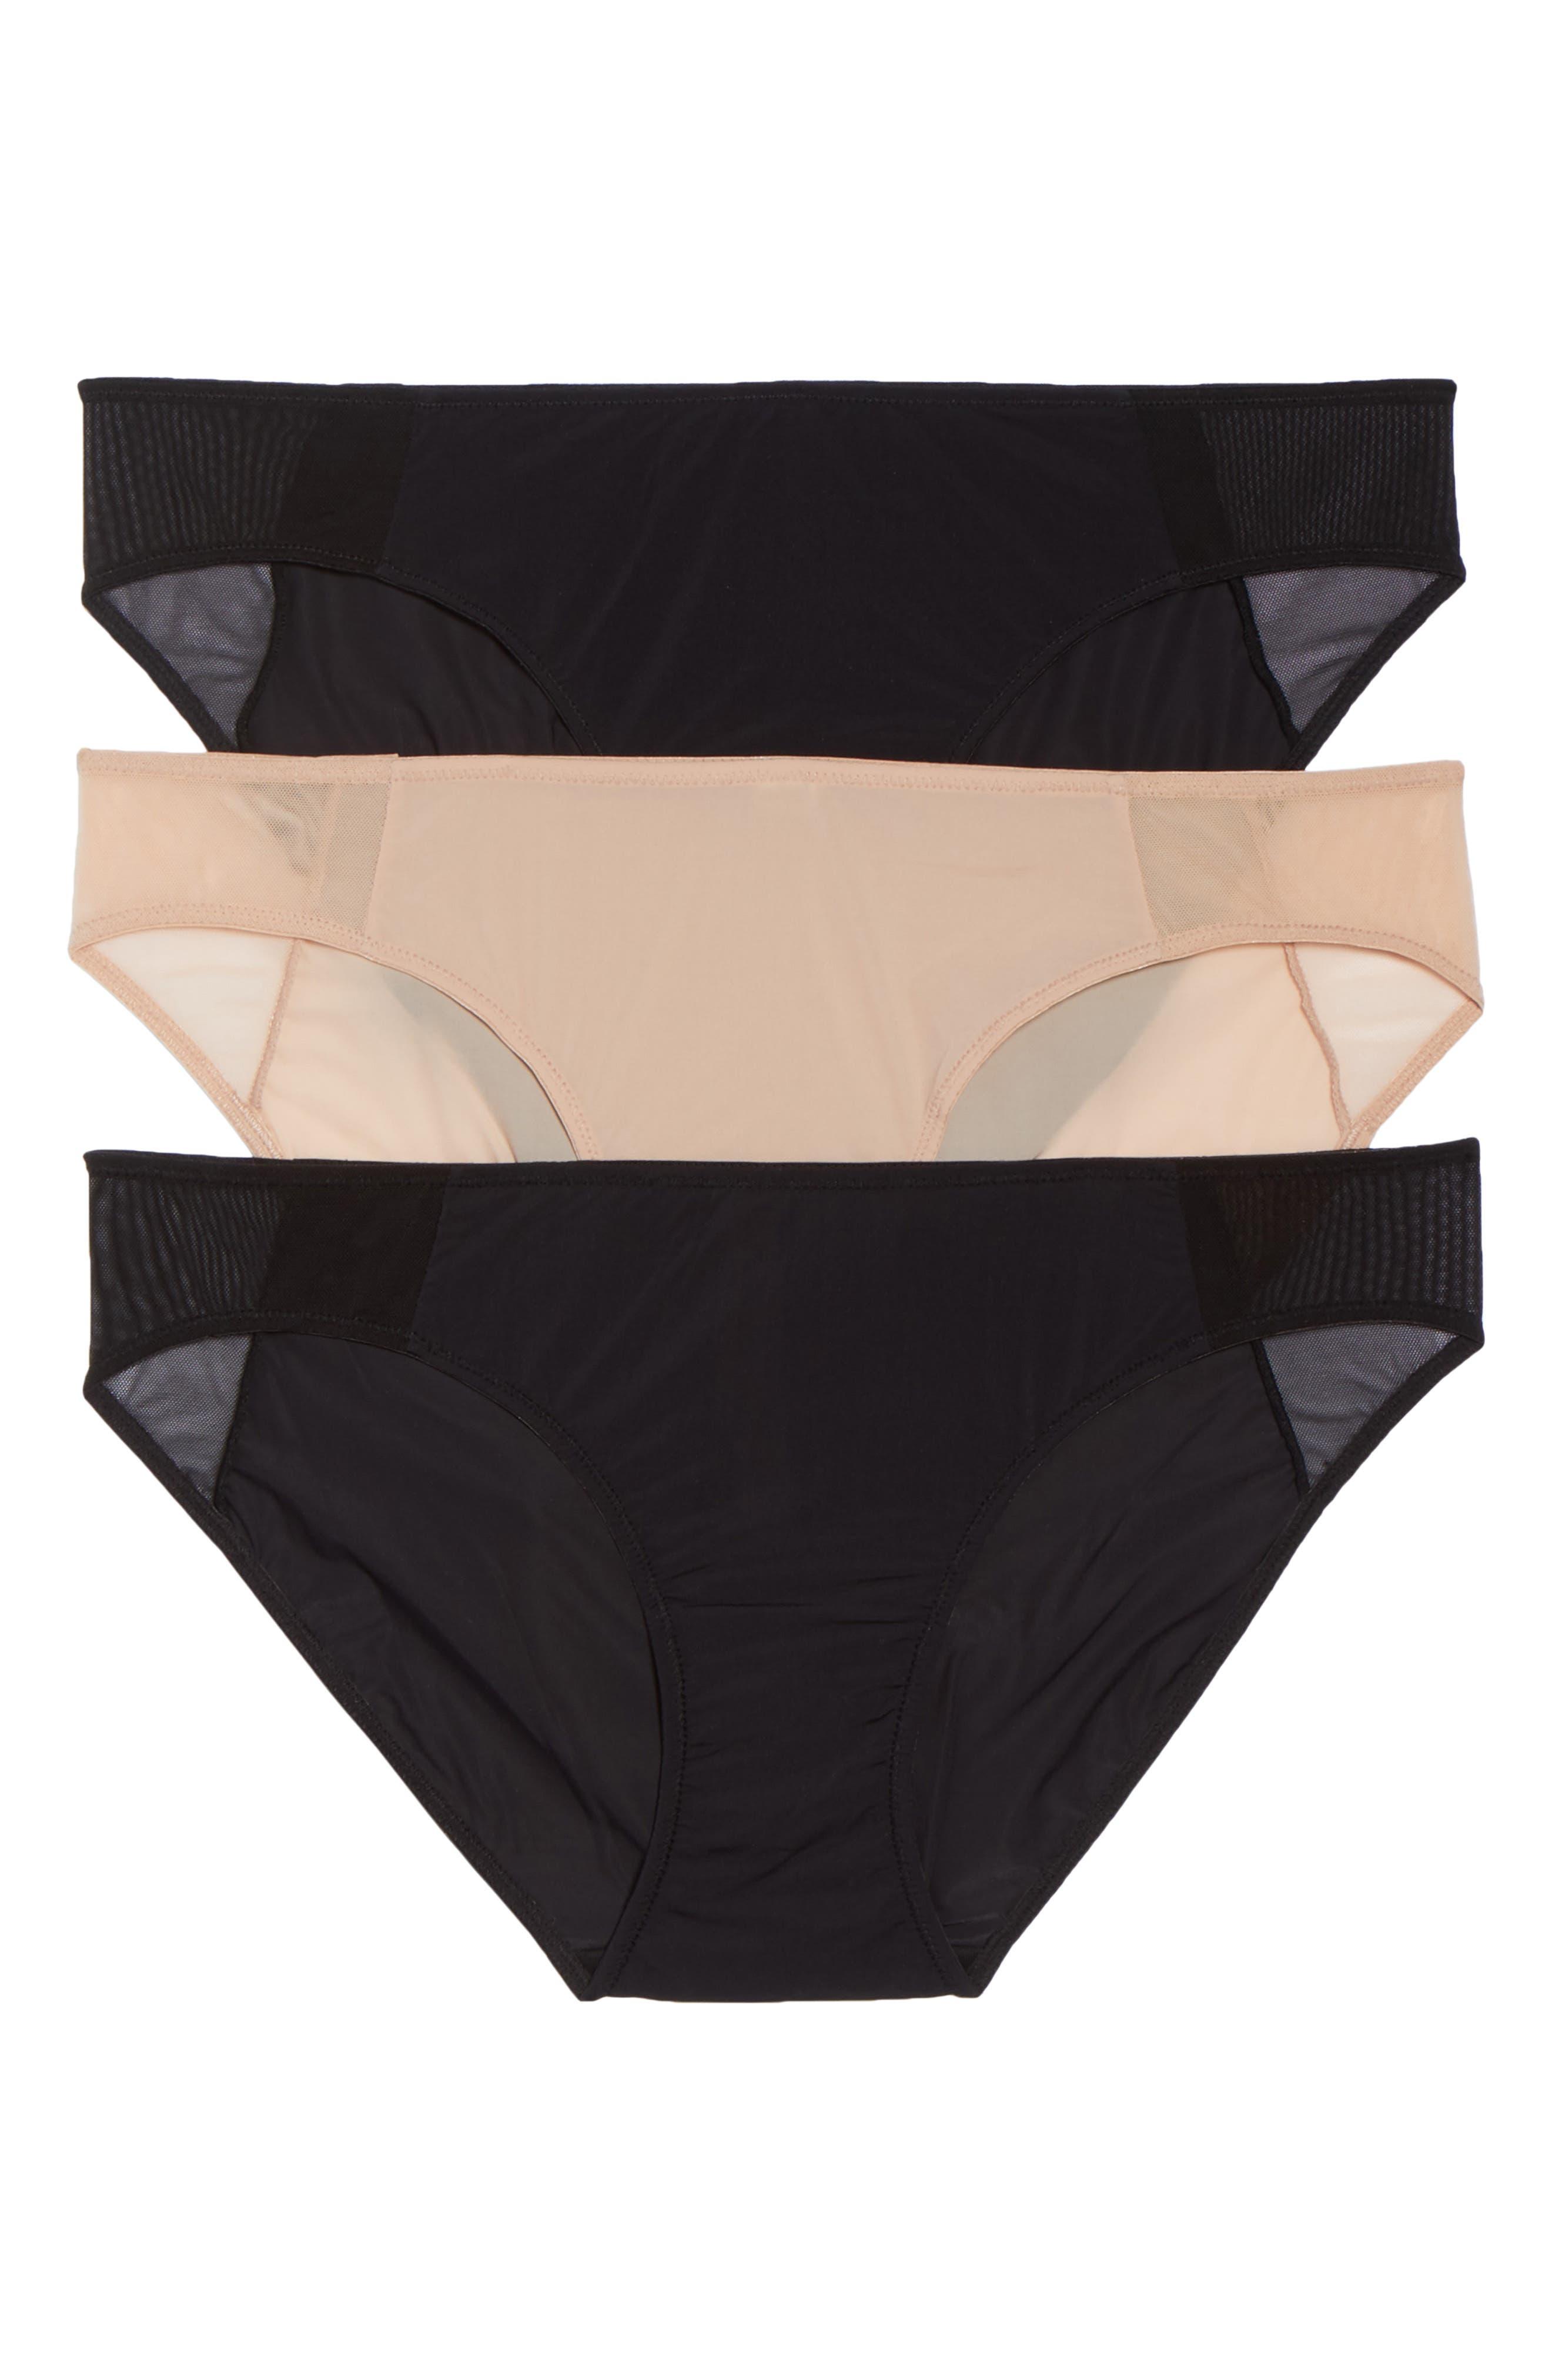 Skin 3-Pack Bikini,                             Main thumbnail 1, color,                             Black Beige